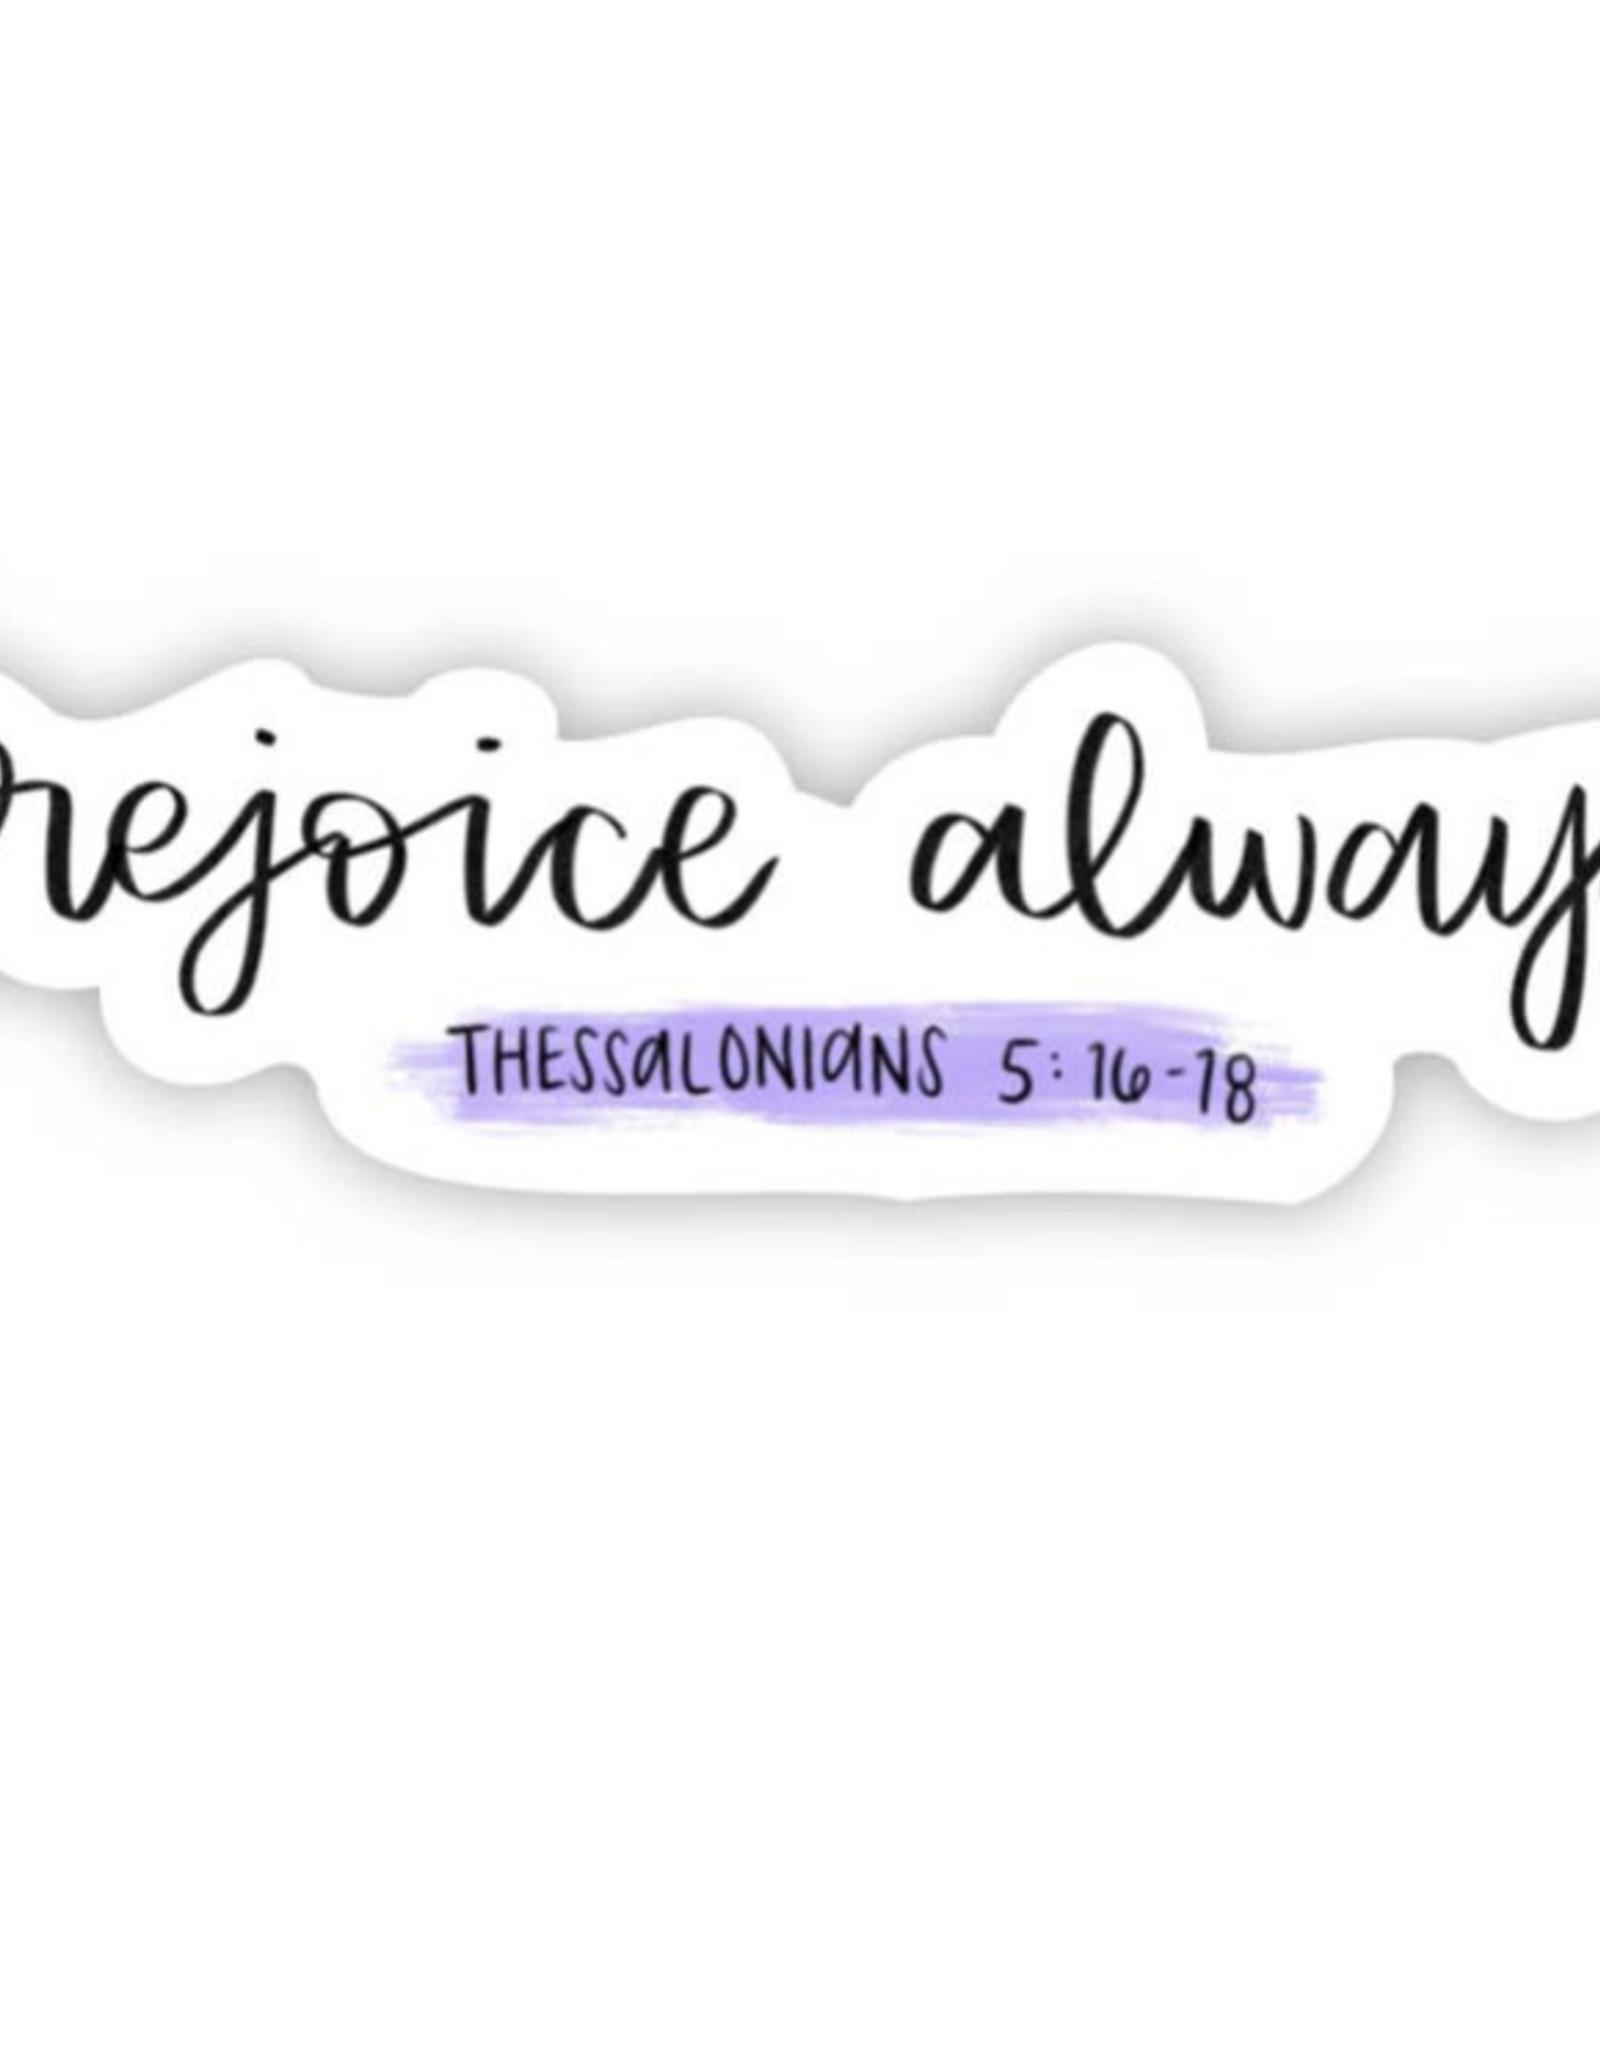 Big Moods Thessalonians 5:16-18 sticker